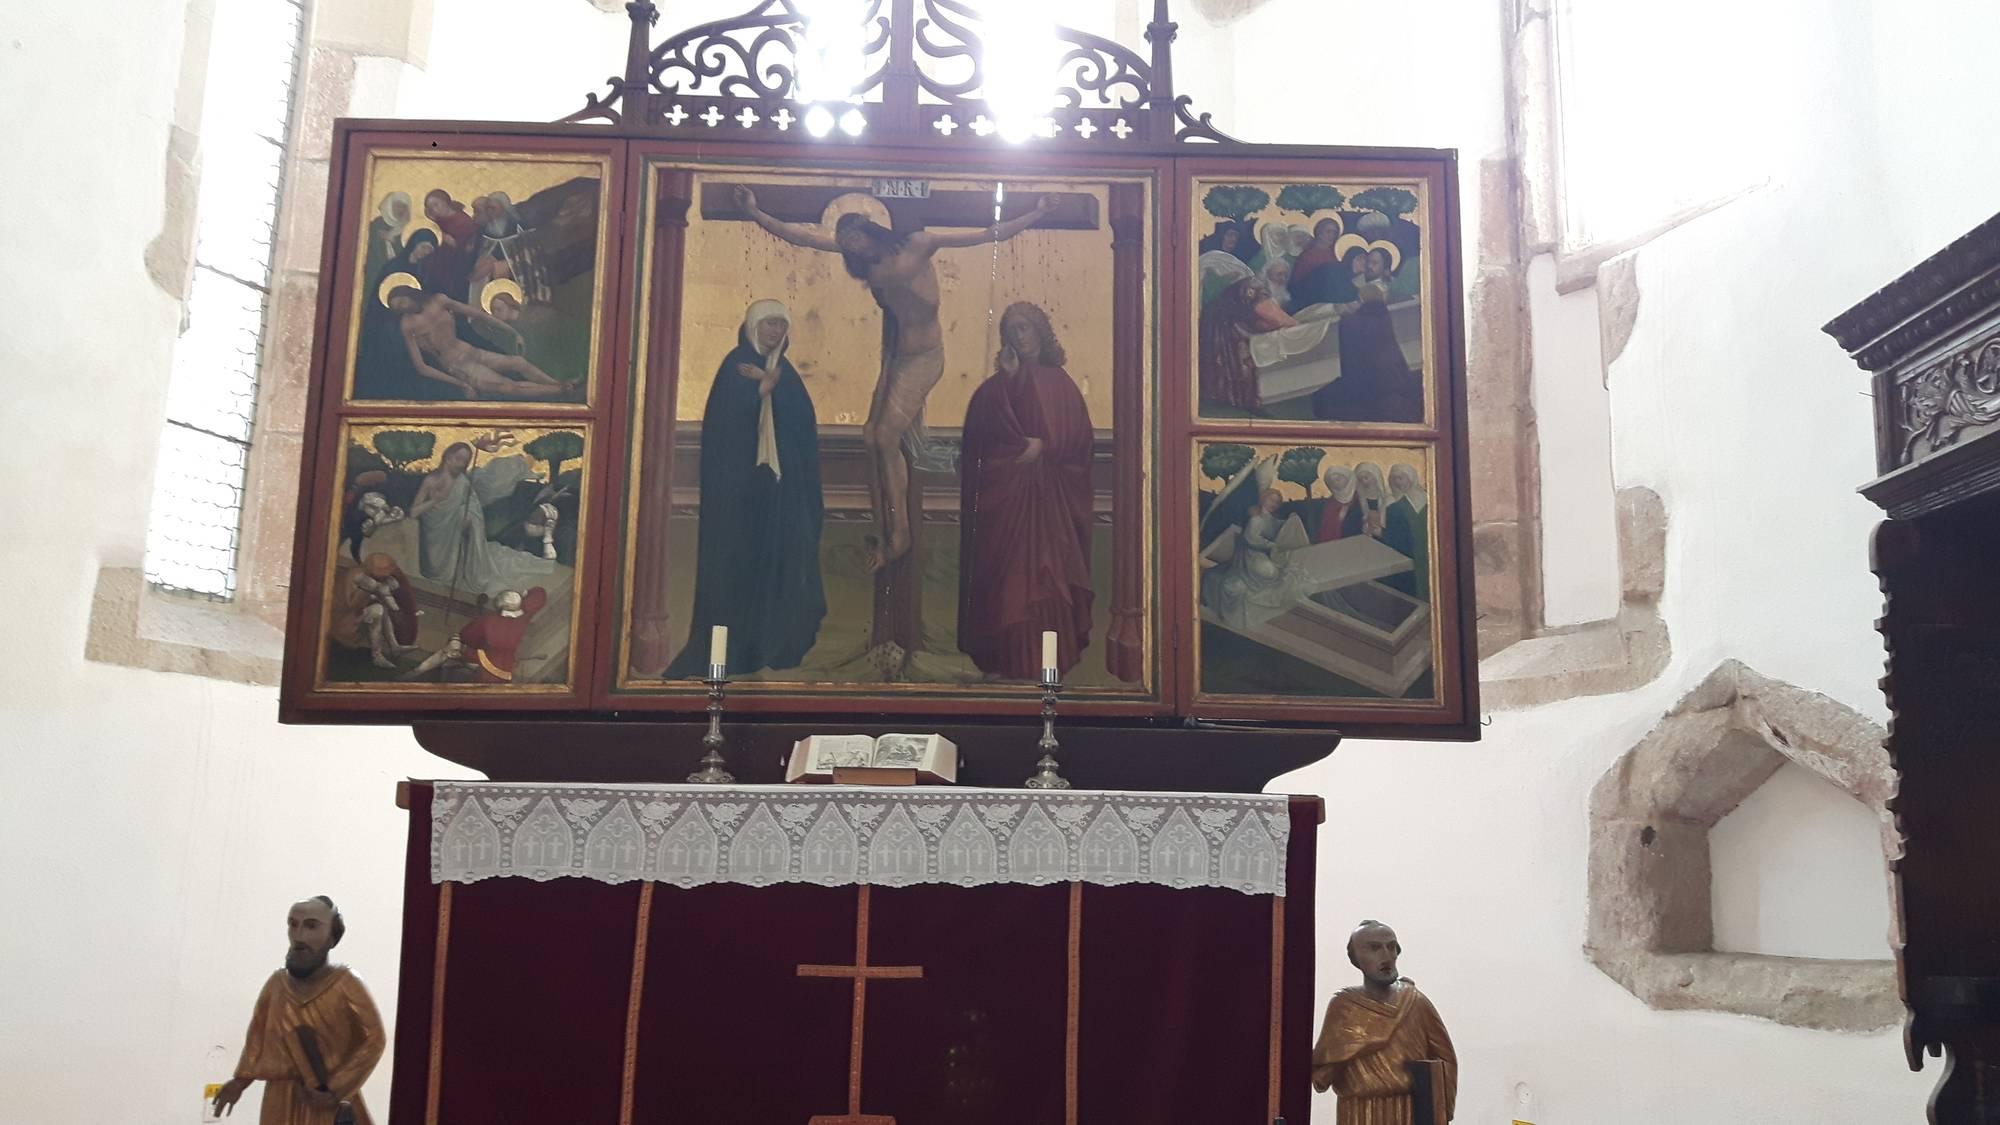 Eglise-fortifiee-Prejmer_07-09-2018_07